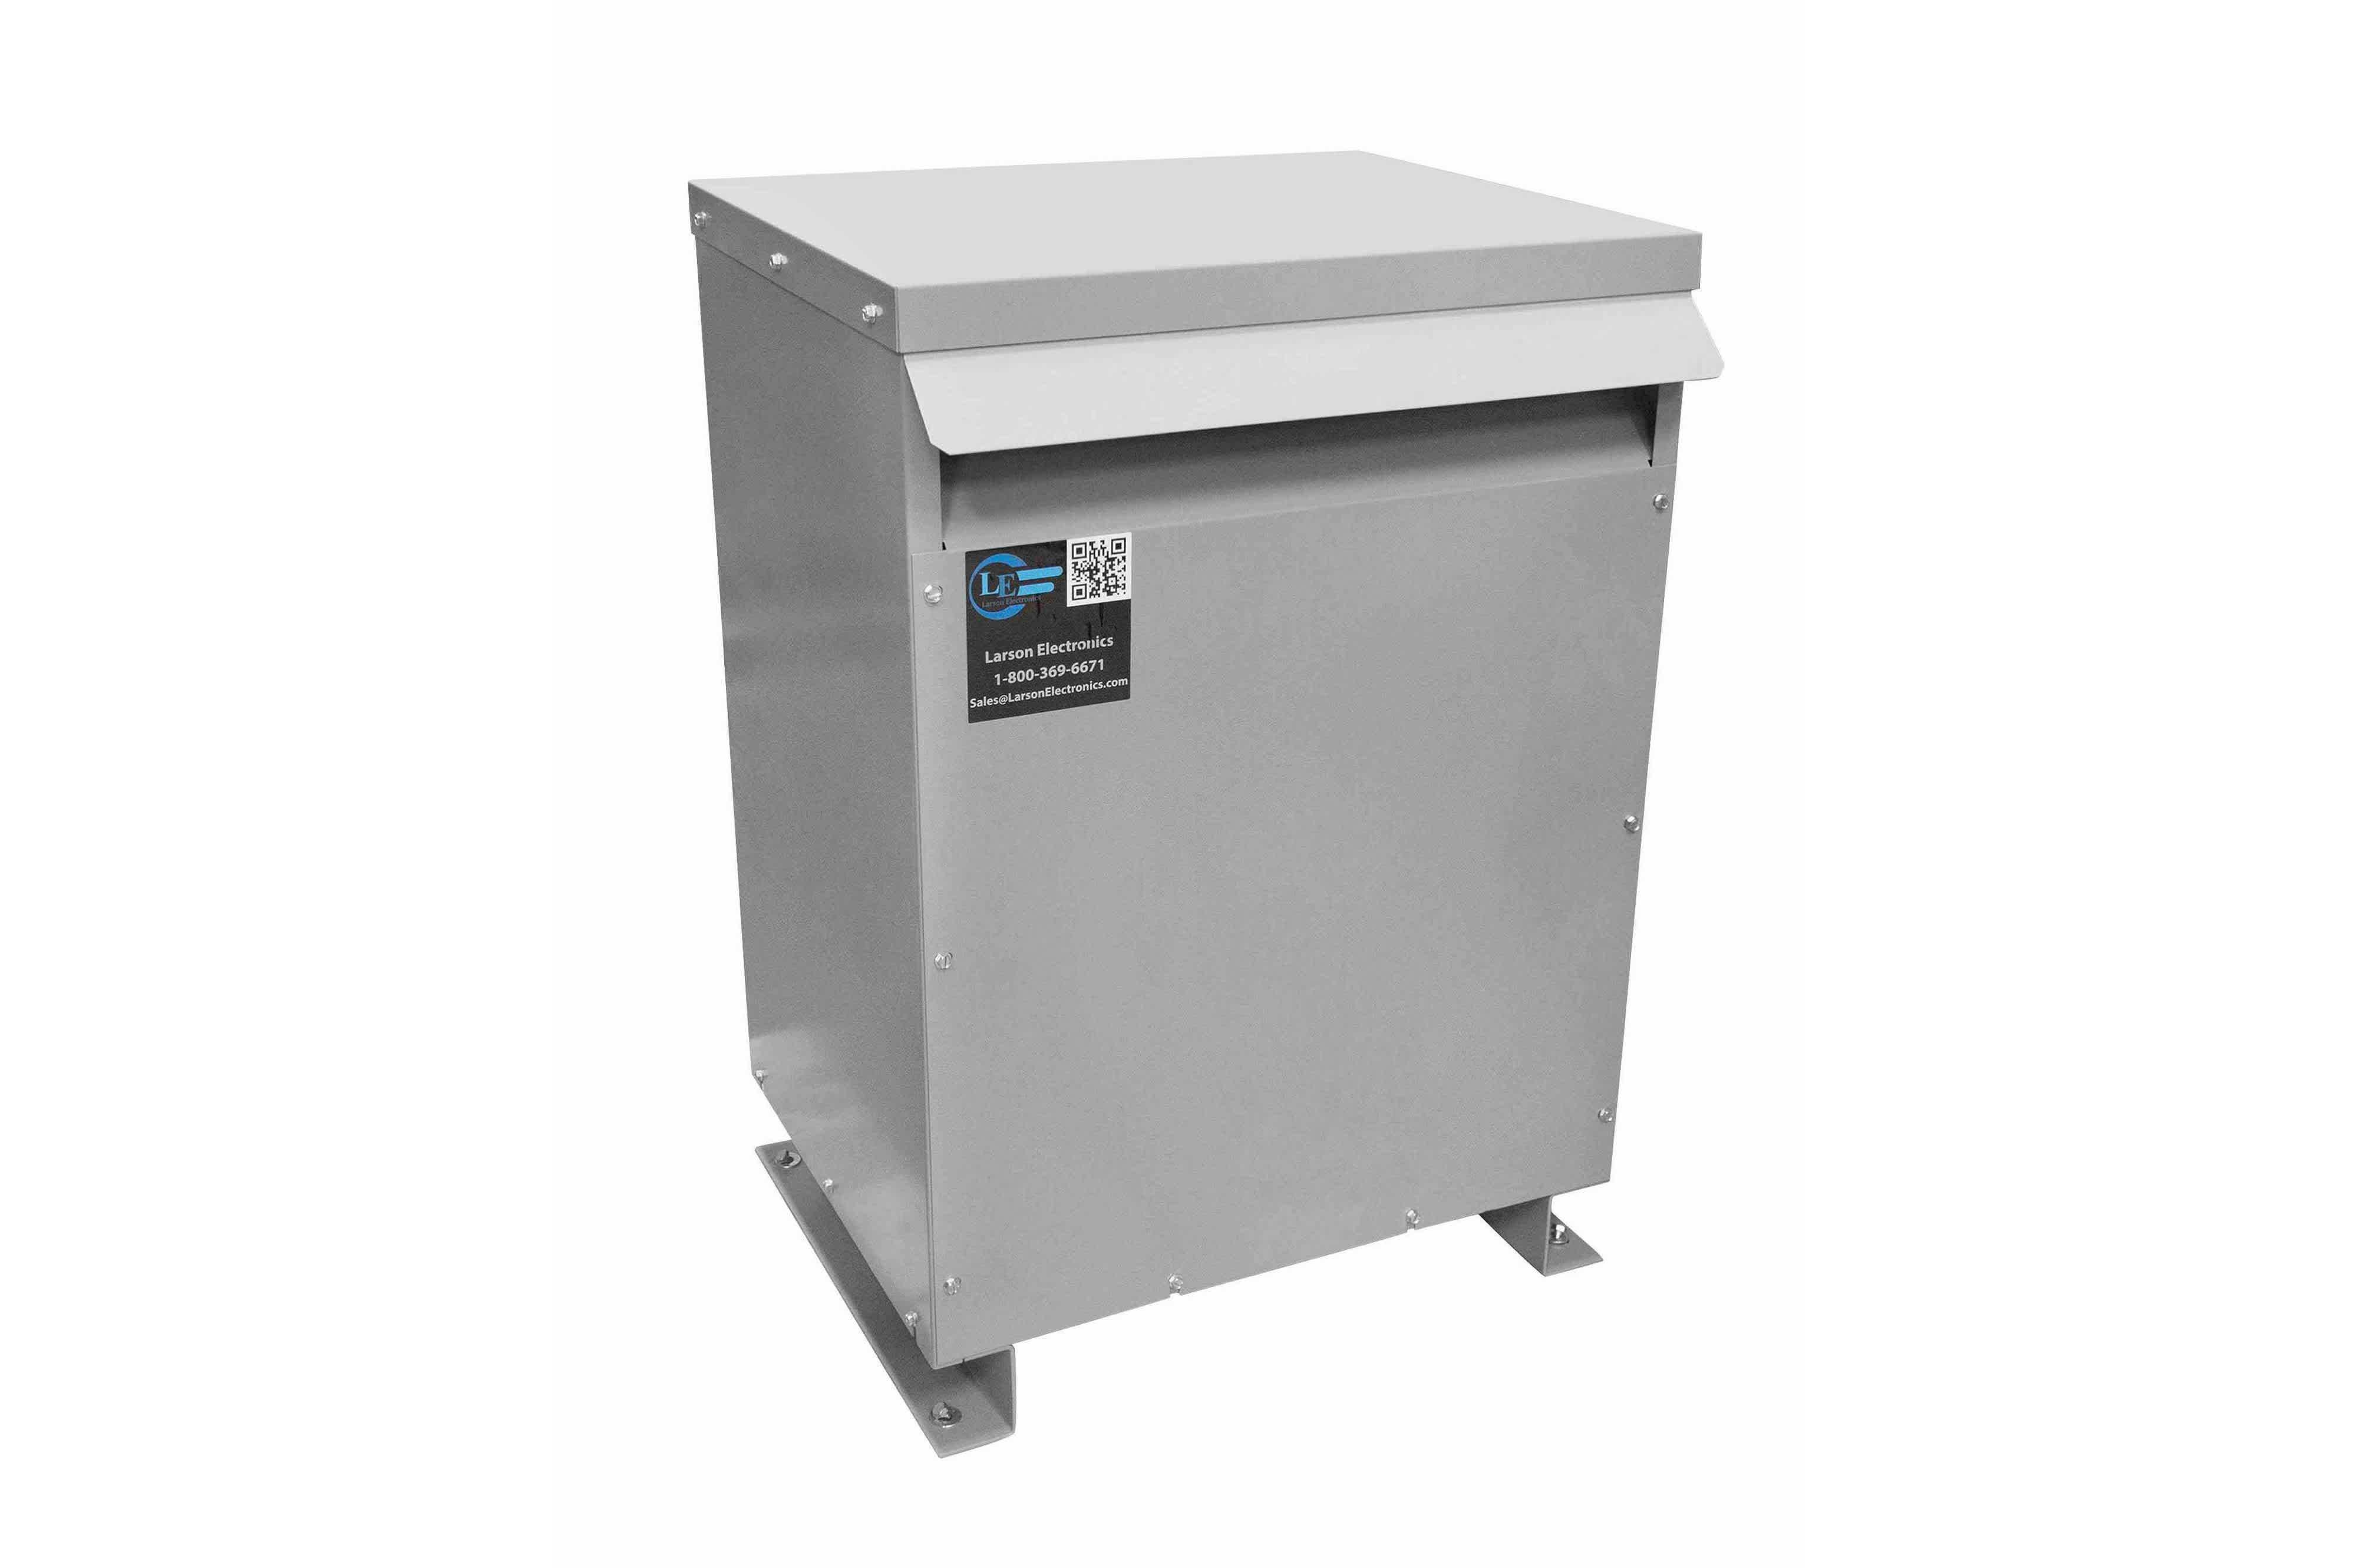 25 kVA 3PH DOE Transformer, 575V Delta Primary, 415Y/240 Wye-N Secondary, N3R, Ventilated, 60 Hz